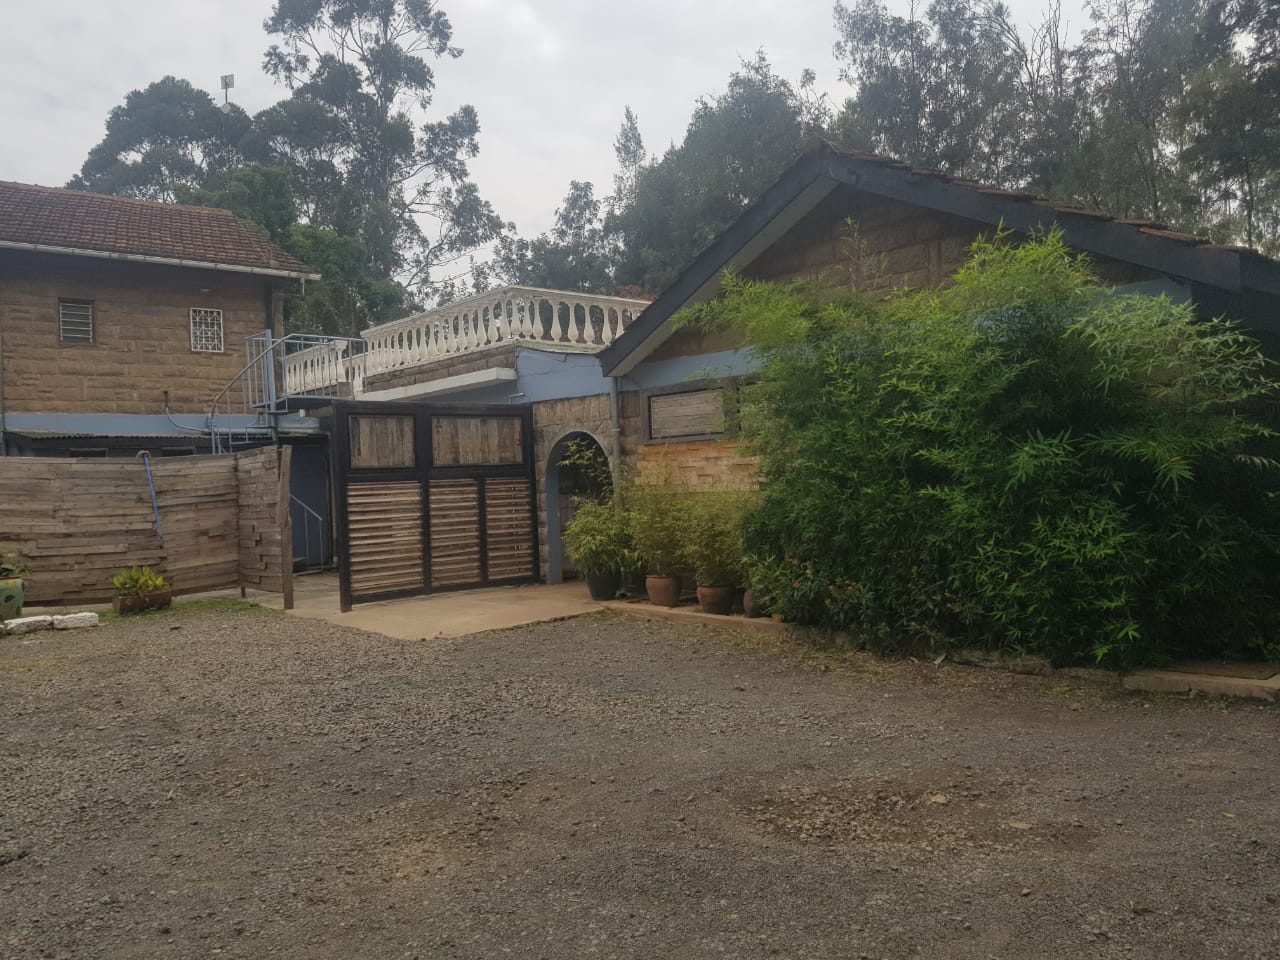 Commercial Property To Let Ideal for Restaurant in Prime Location in Karen